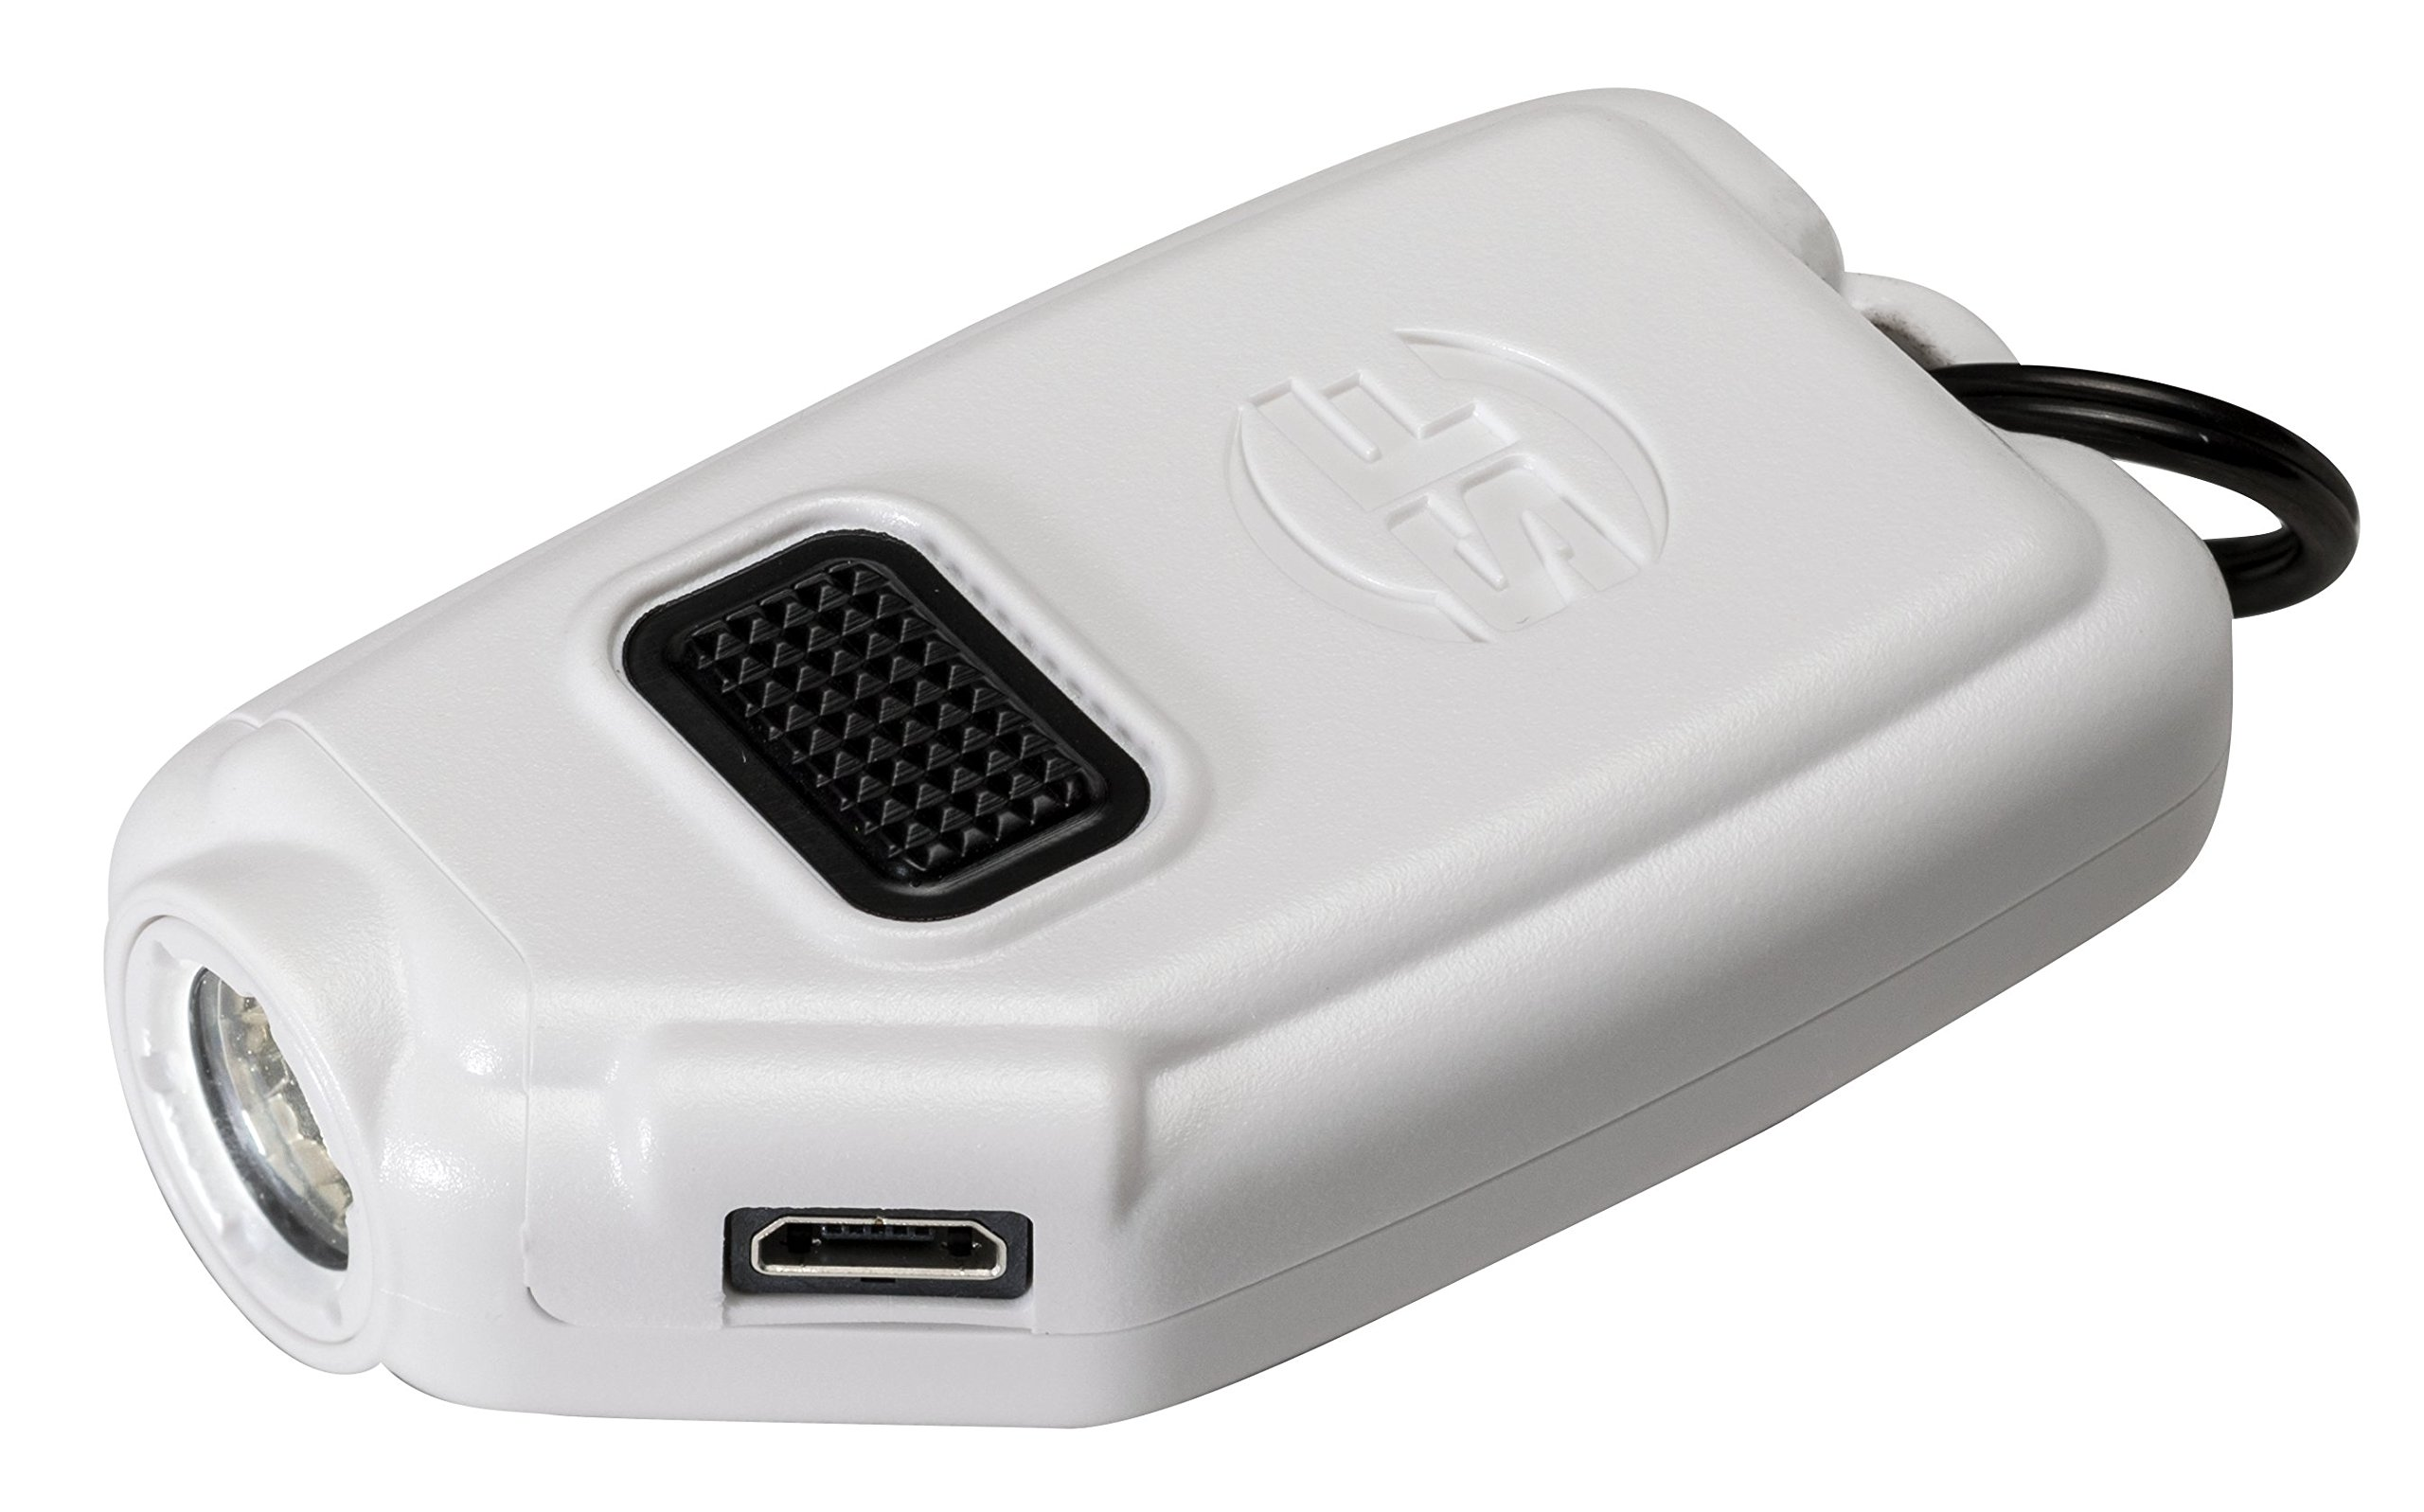 SureFire Sidekick Ultra-Compact Triple-Output Keychain Light, White